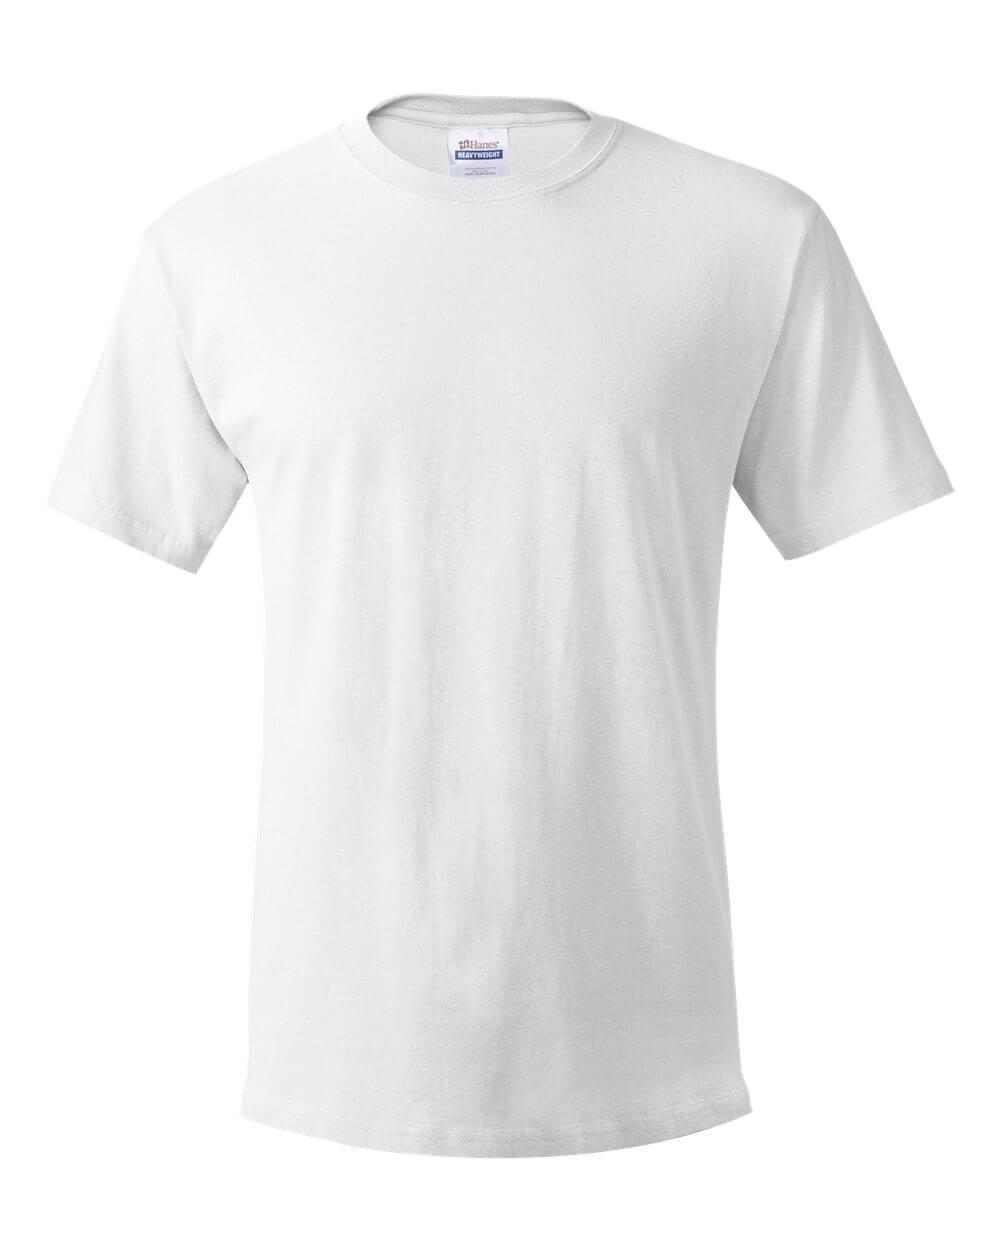 Hanes_White Custom T Shirts